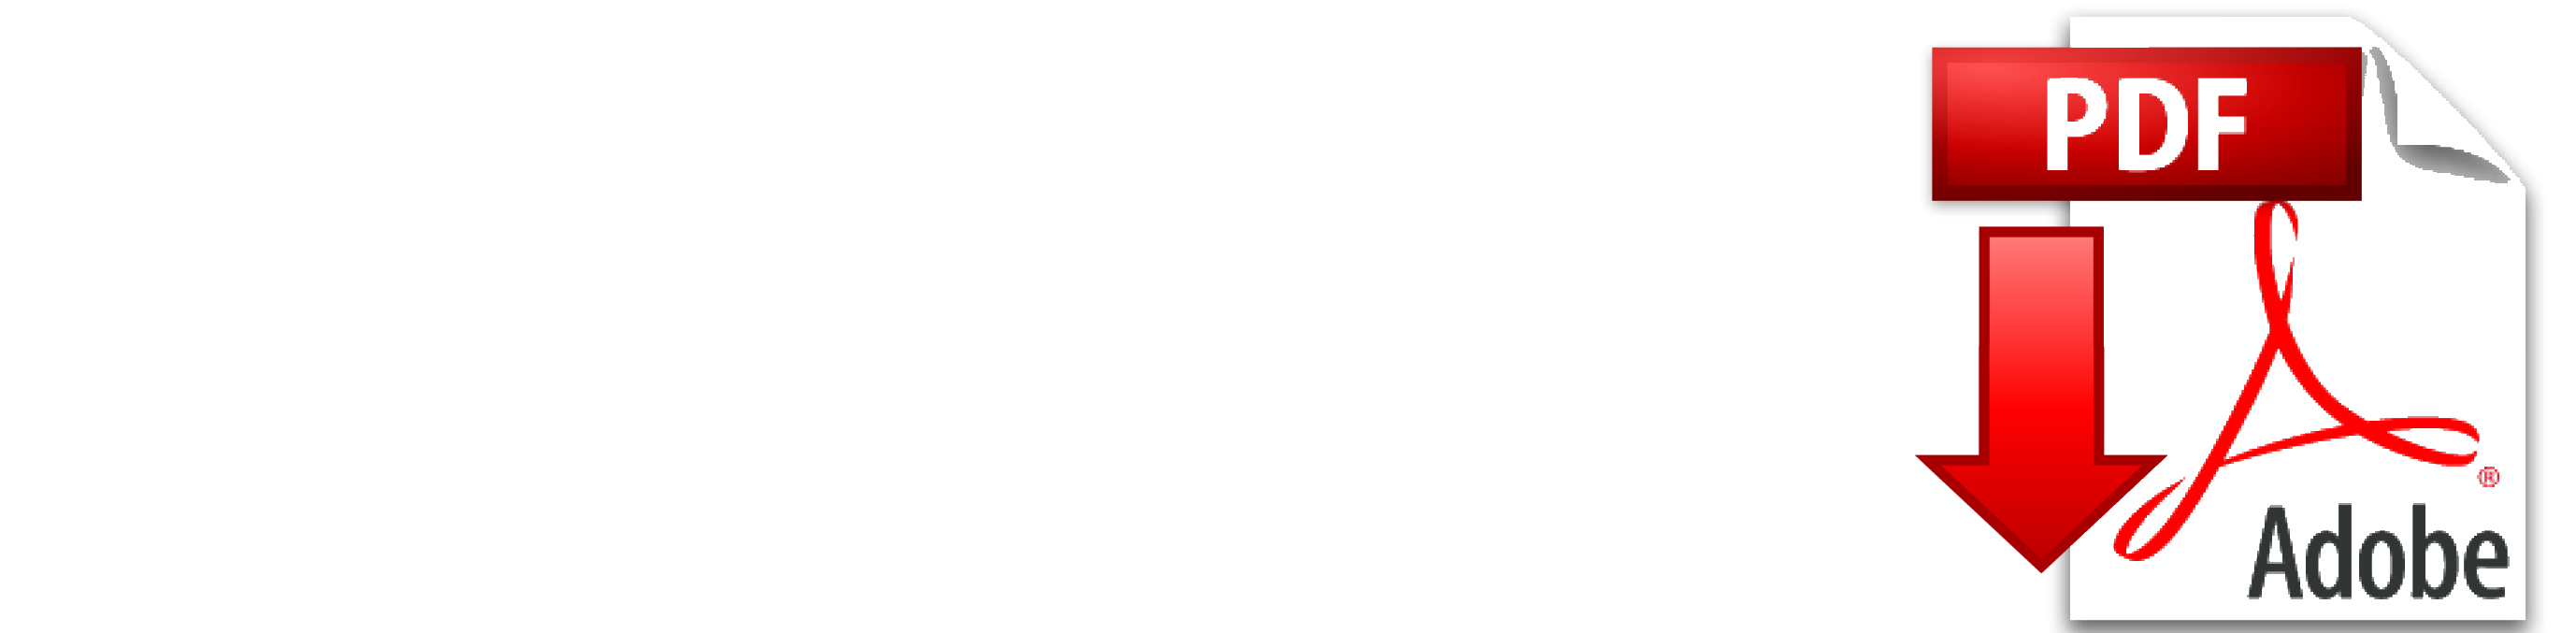 планетарные редукторы